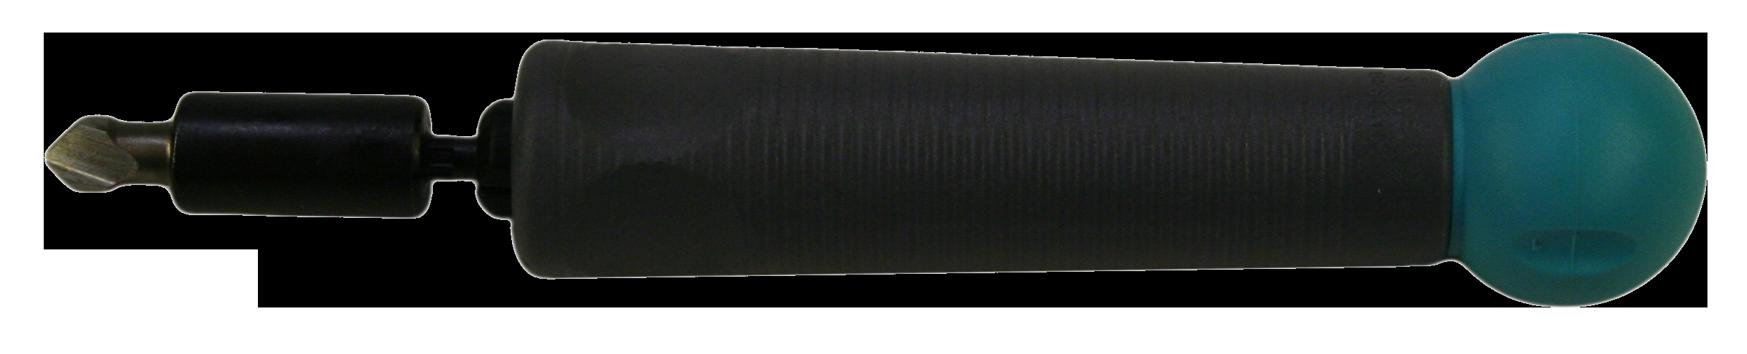 Set Midi SK F <br/>F63 Senker 6.3 mm Image